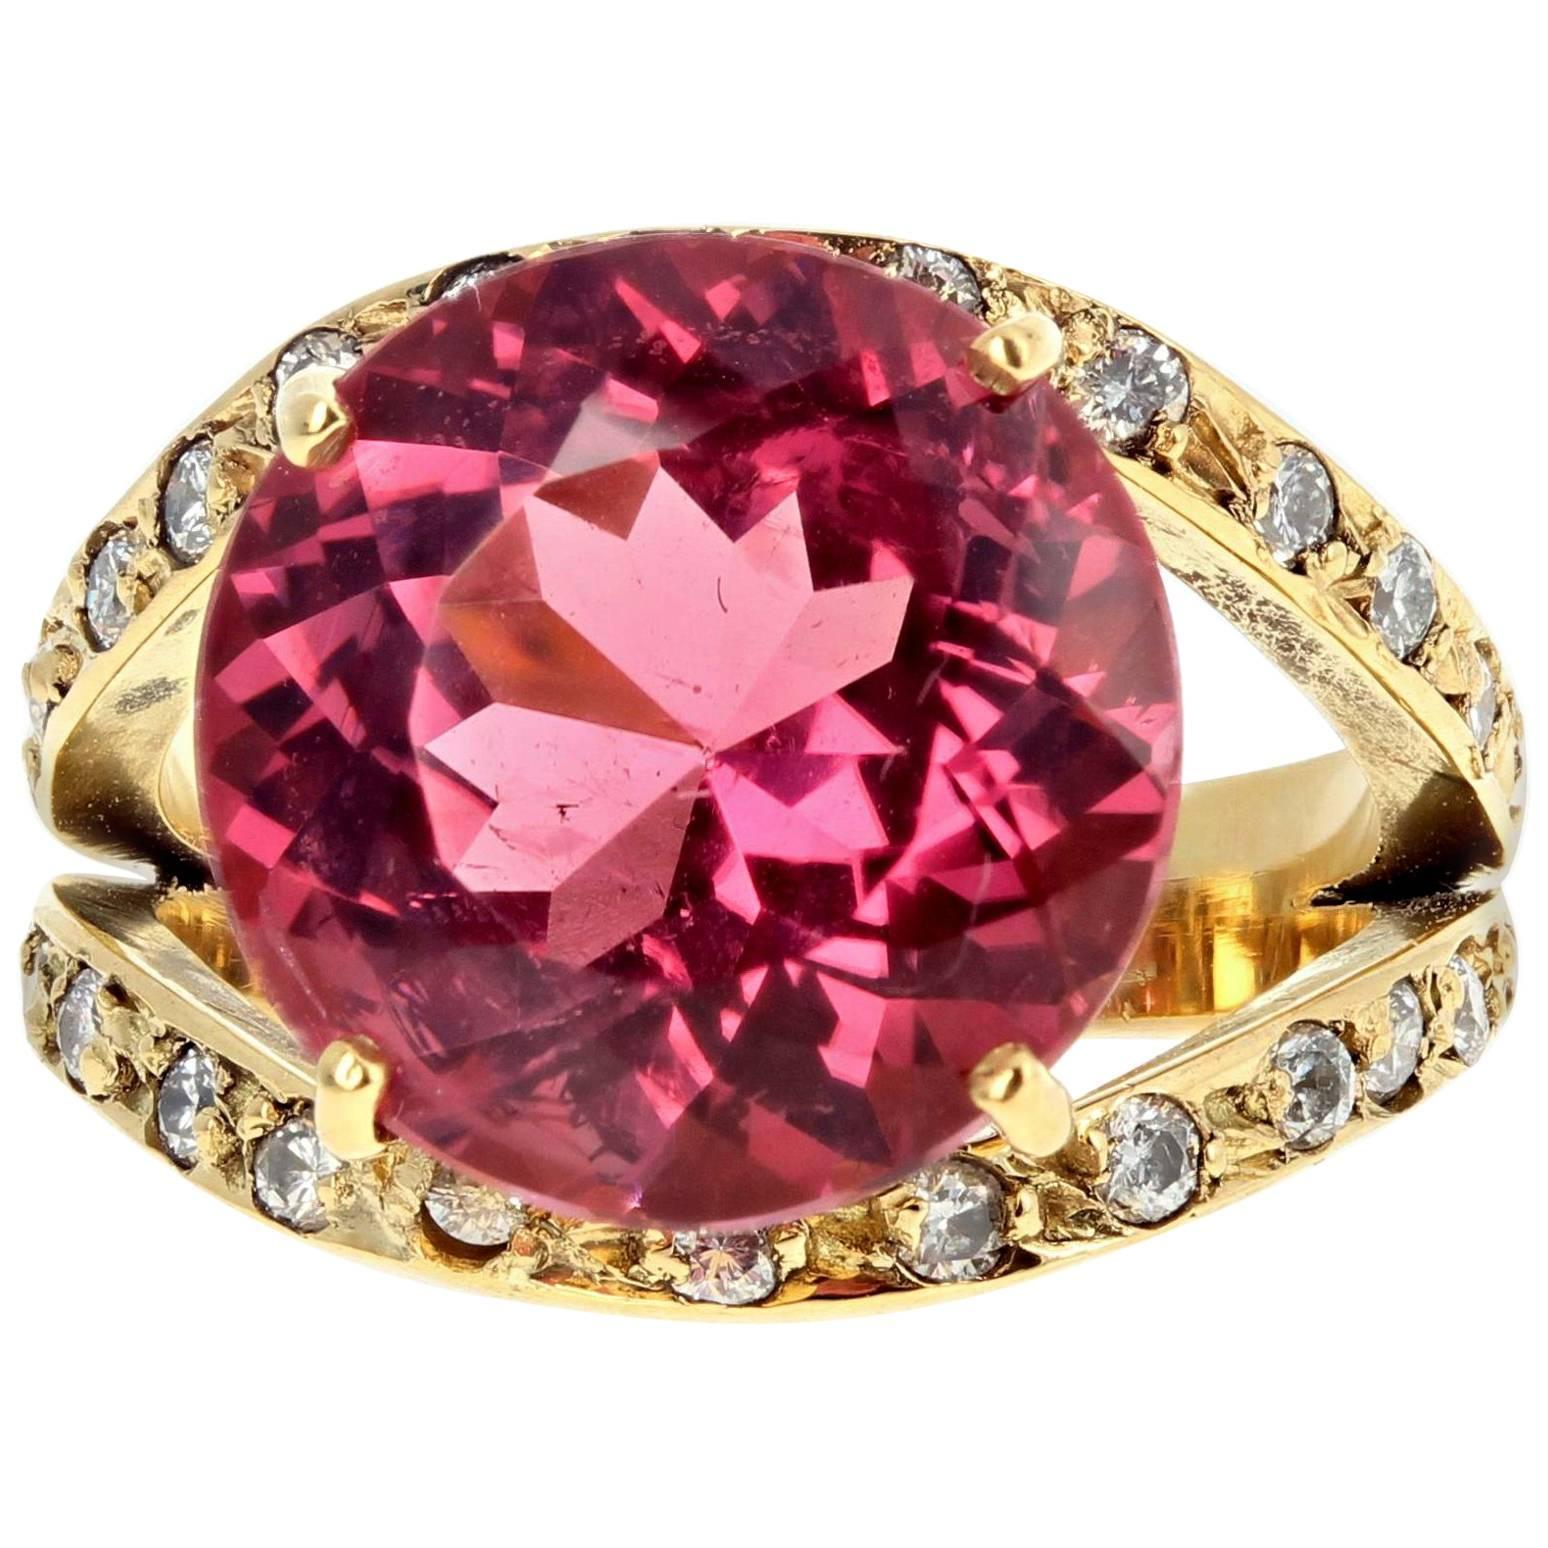 AJD Intense Glittering  8.36 Ct Tourmaline & Diamond 18 Kt Yellow Gold Ring